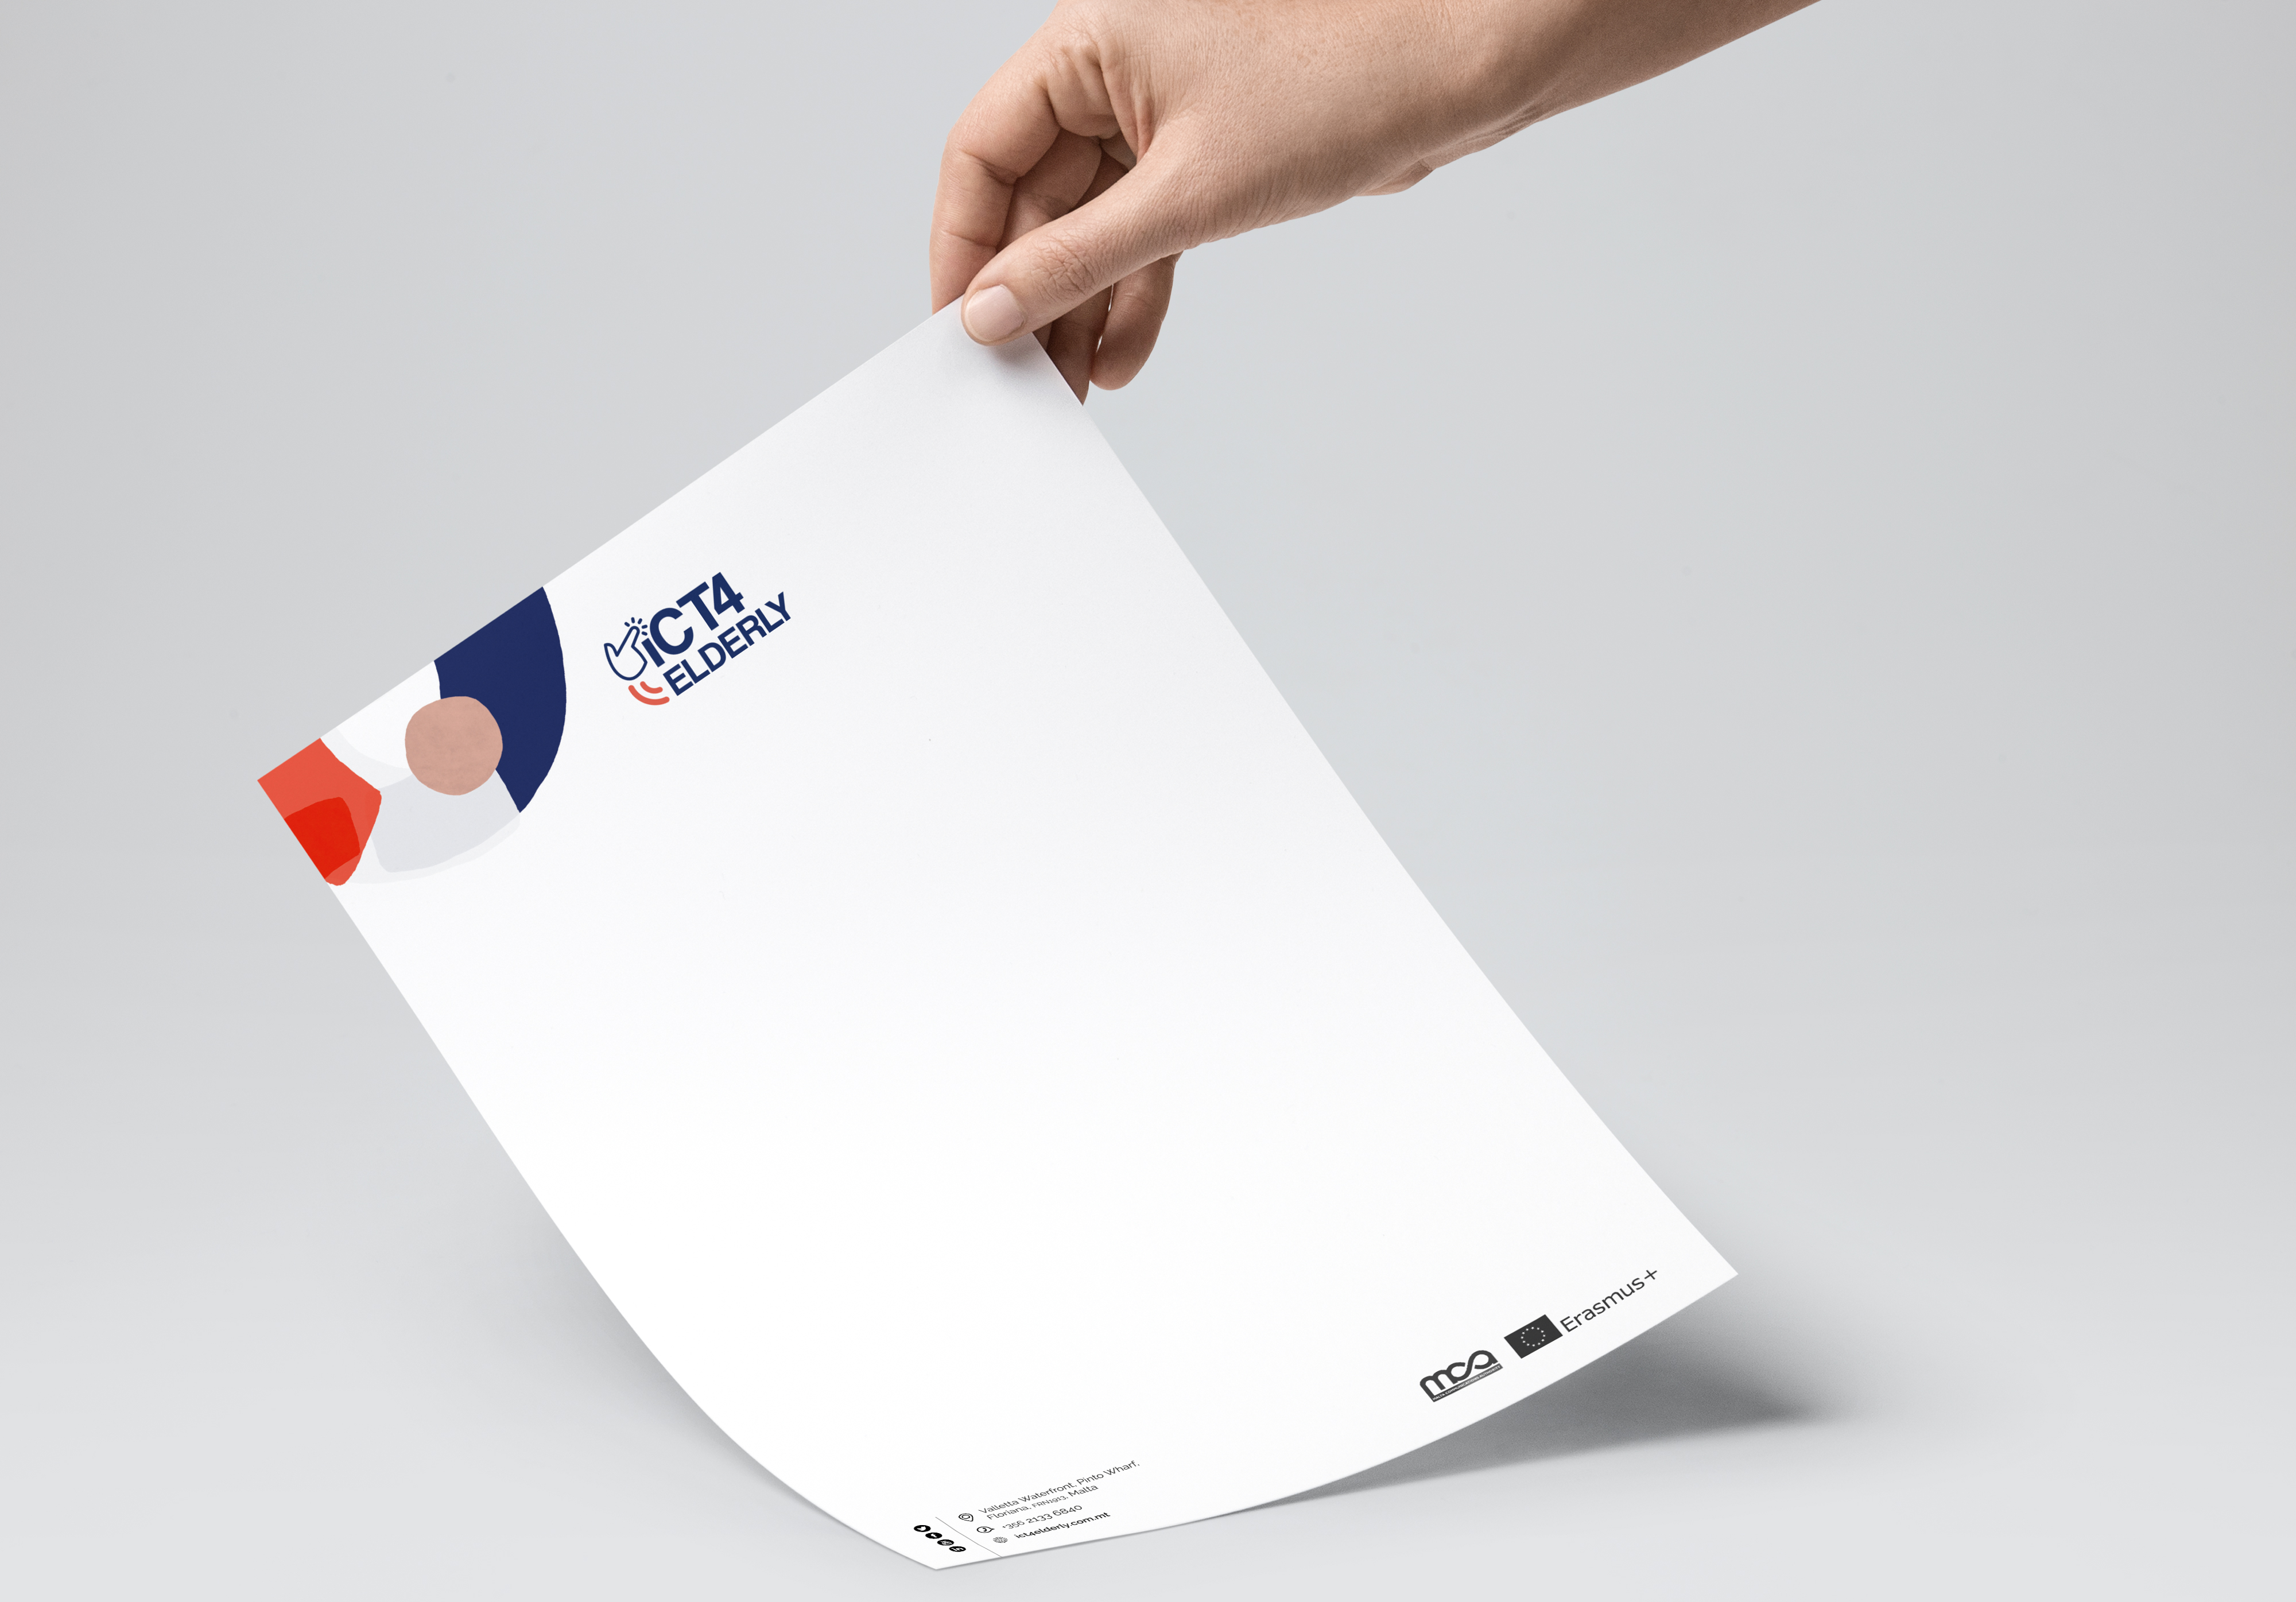 ICT4 Elderly branding